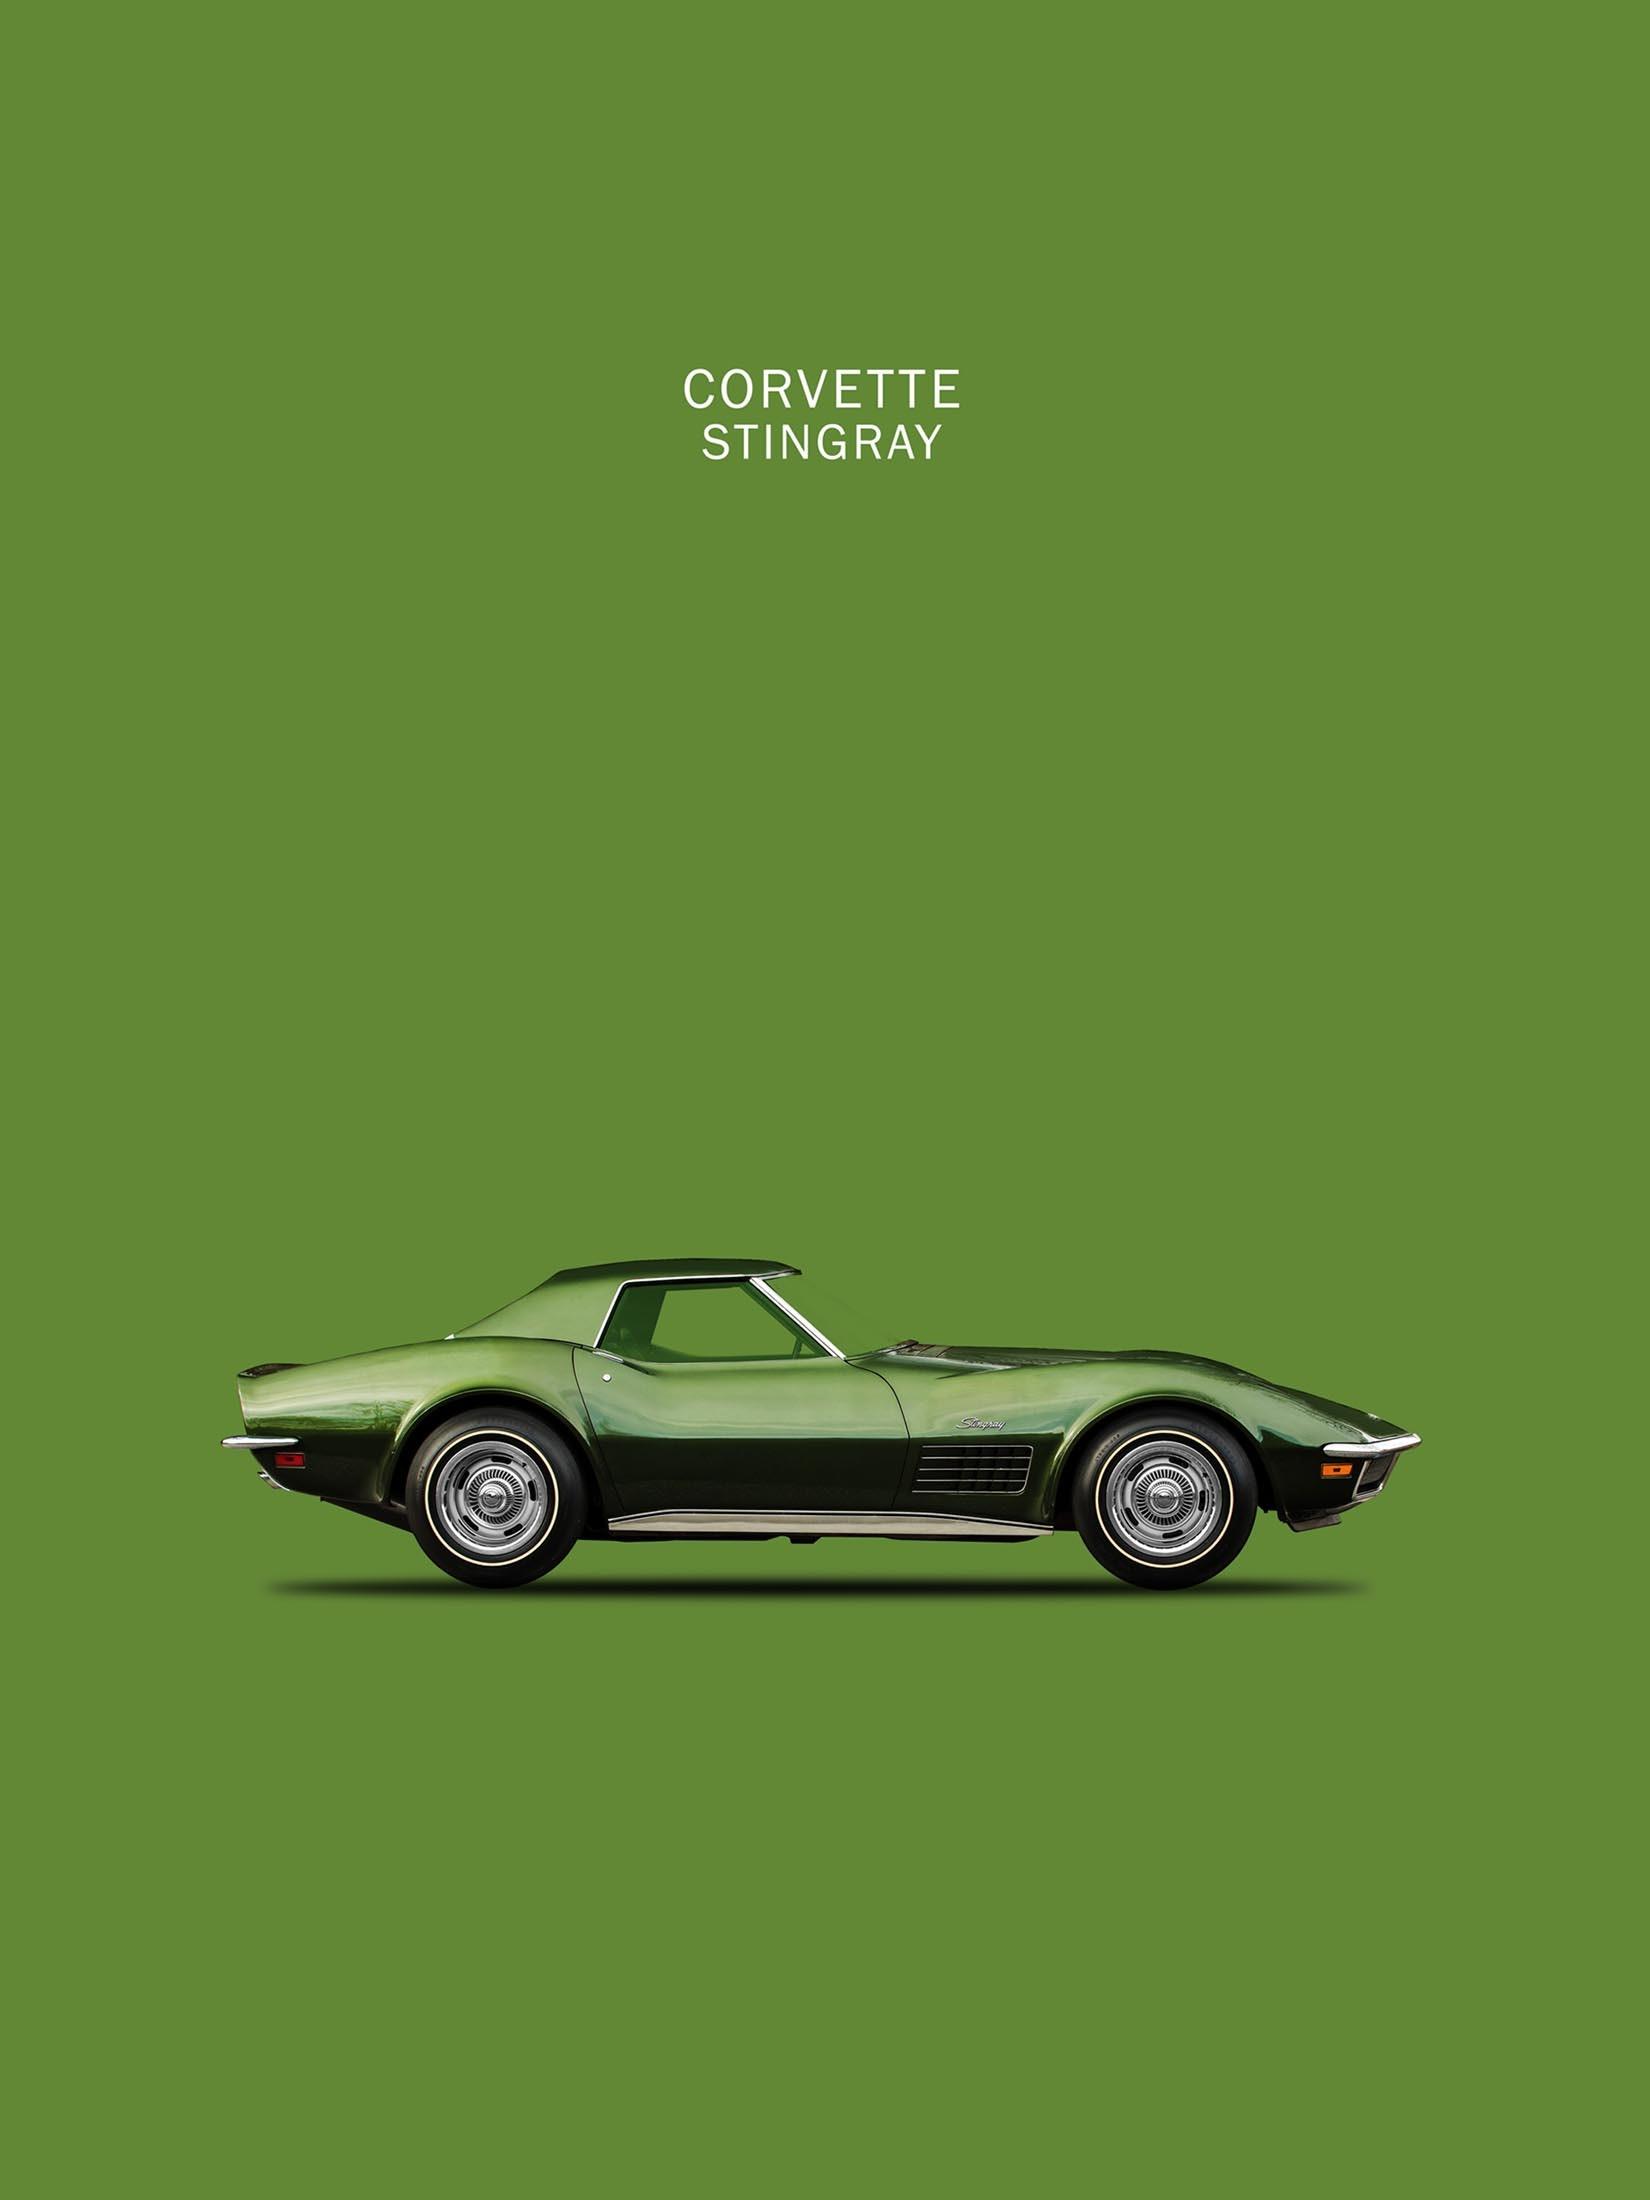 Corvette Stingray C3 (Green)